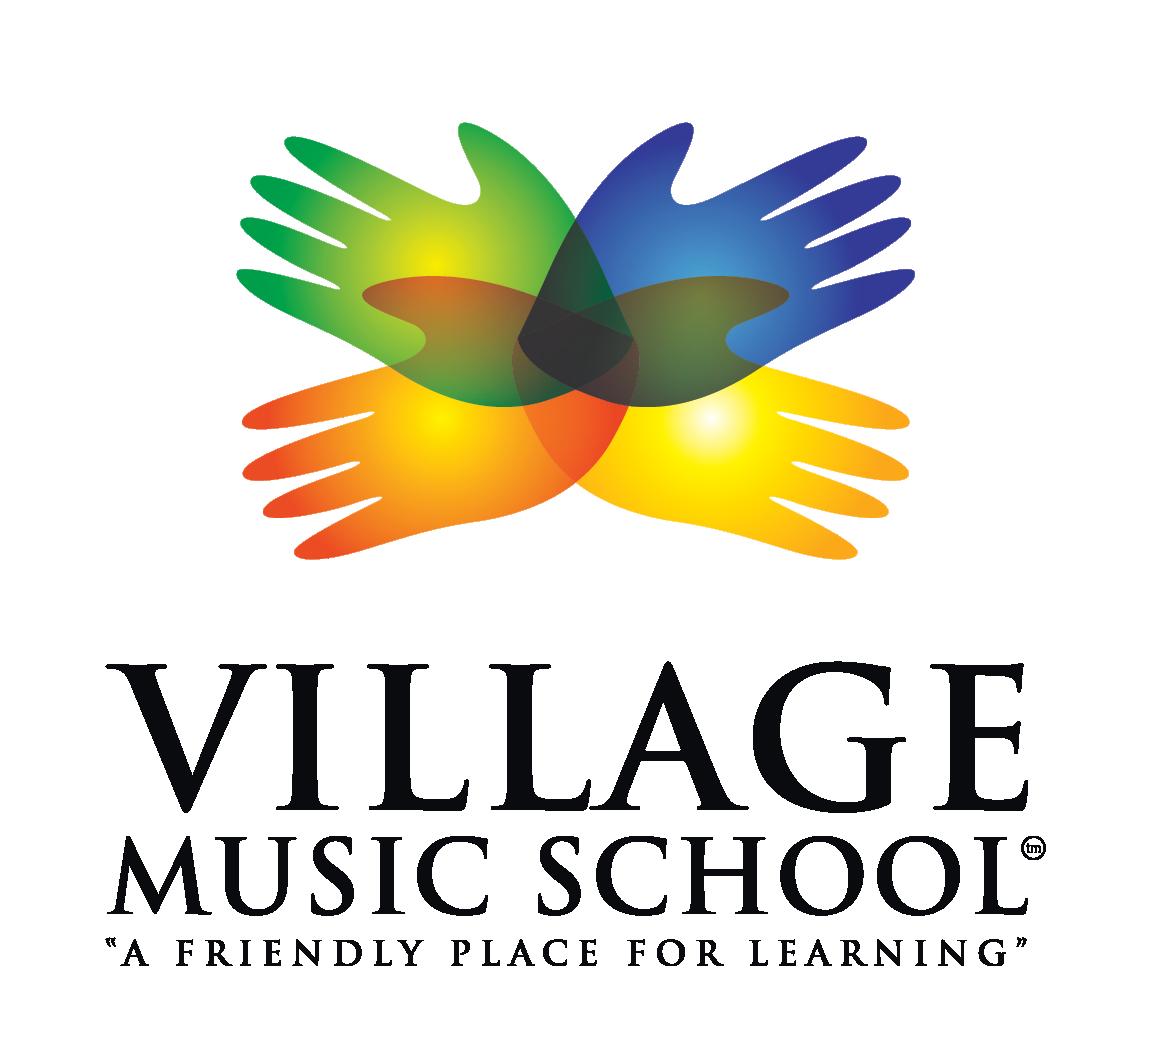 Village_Music School_V.png